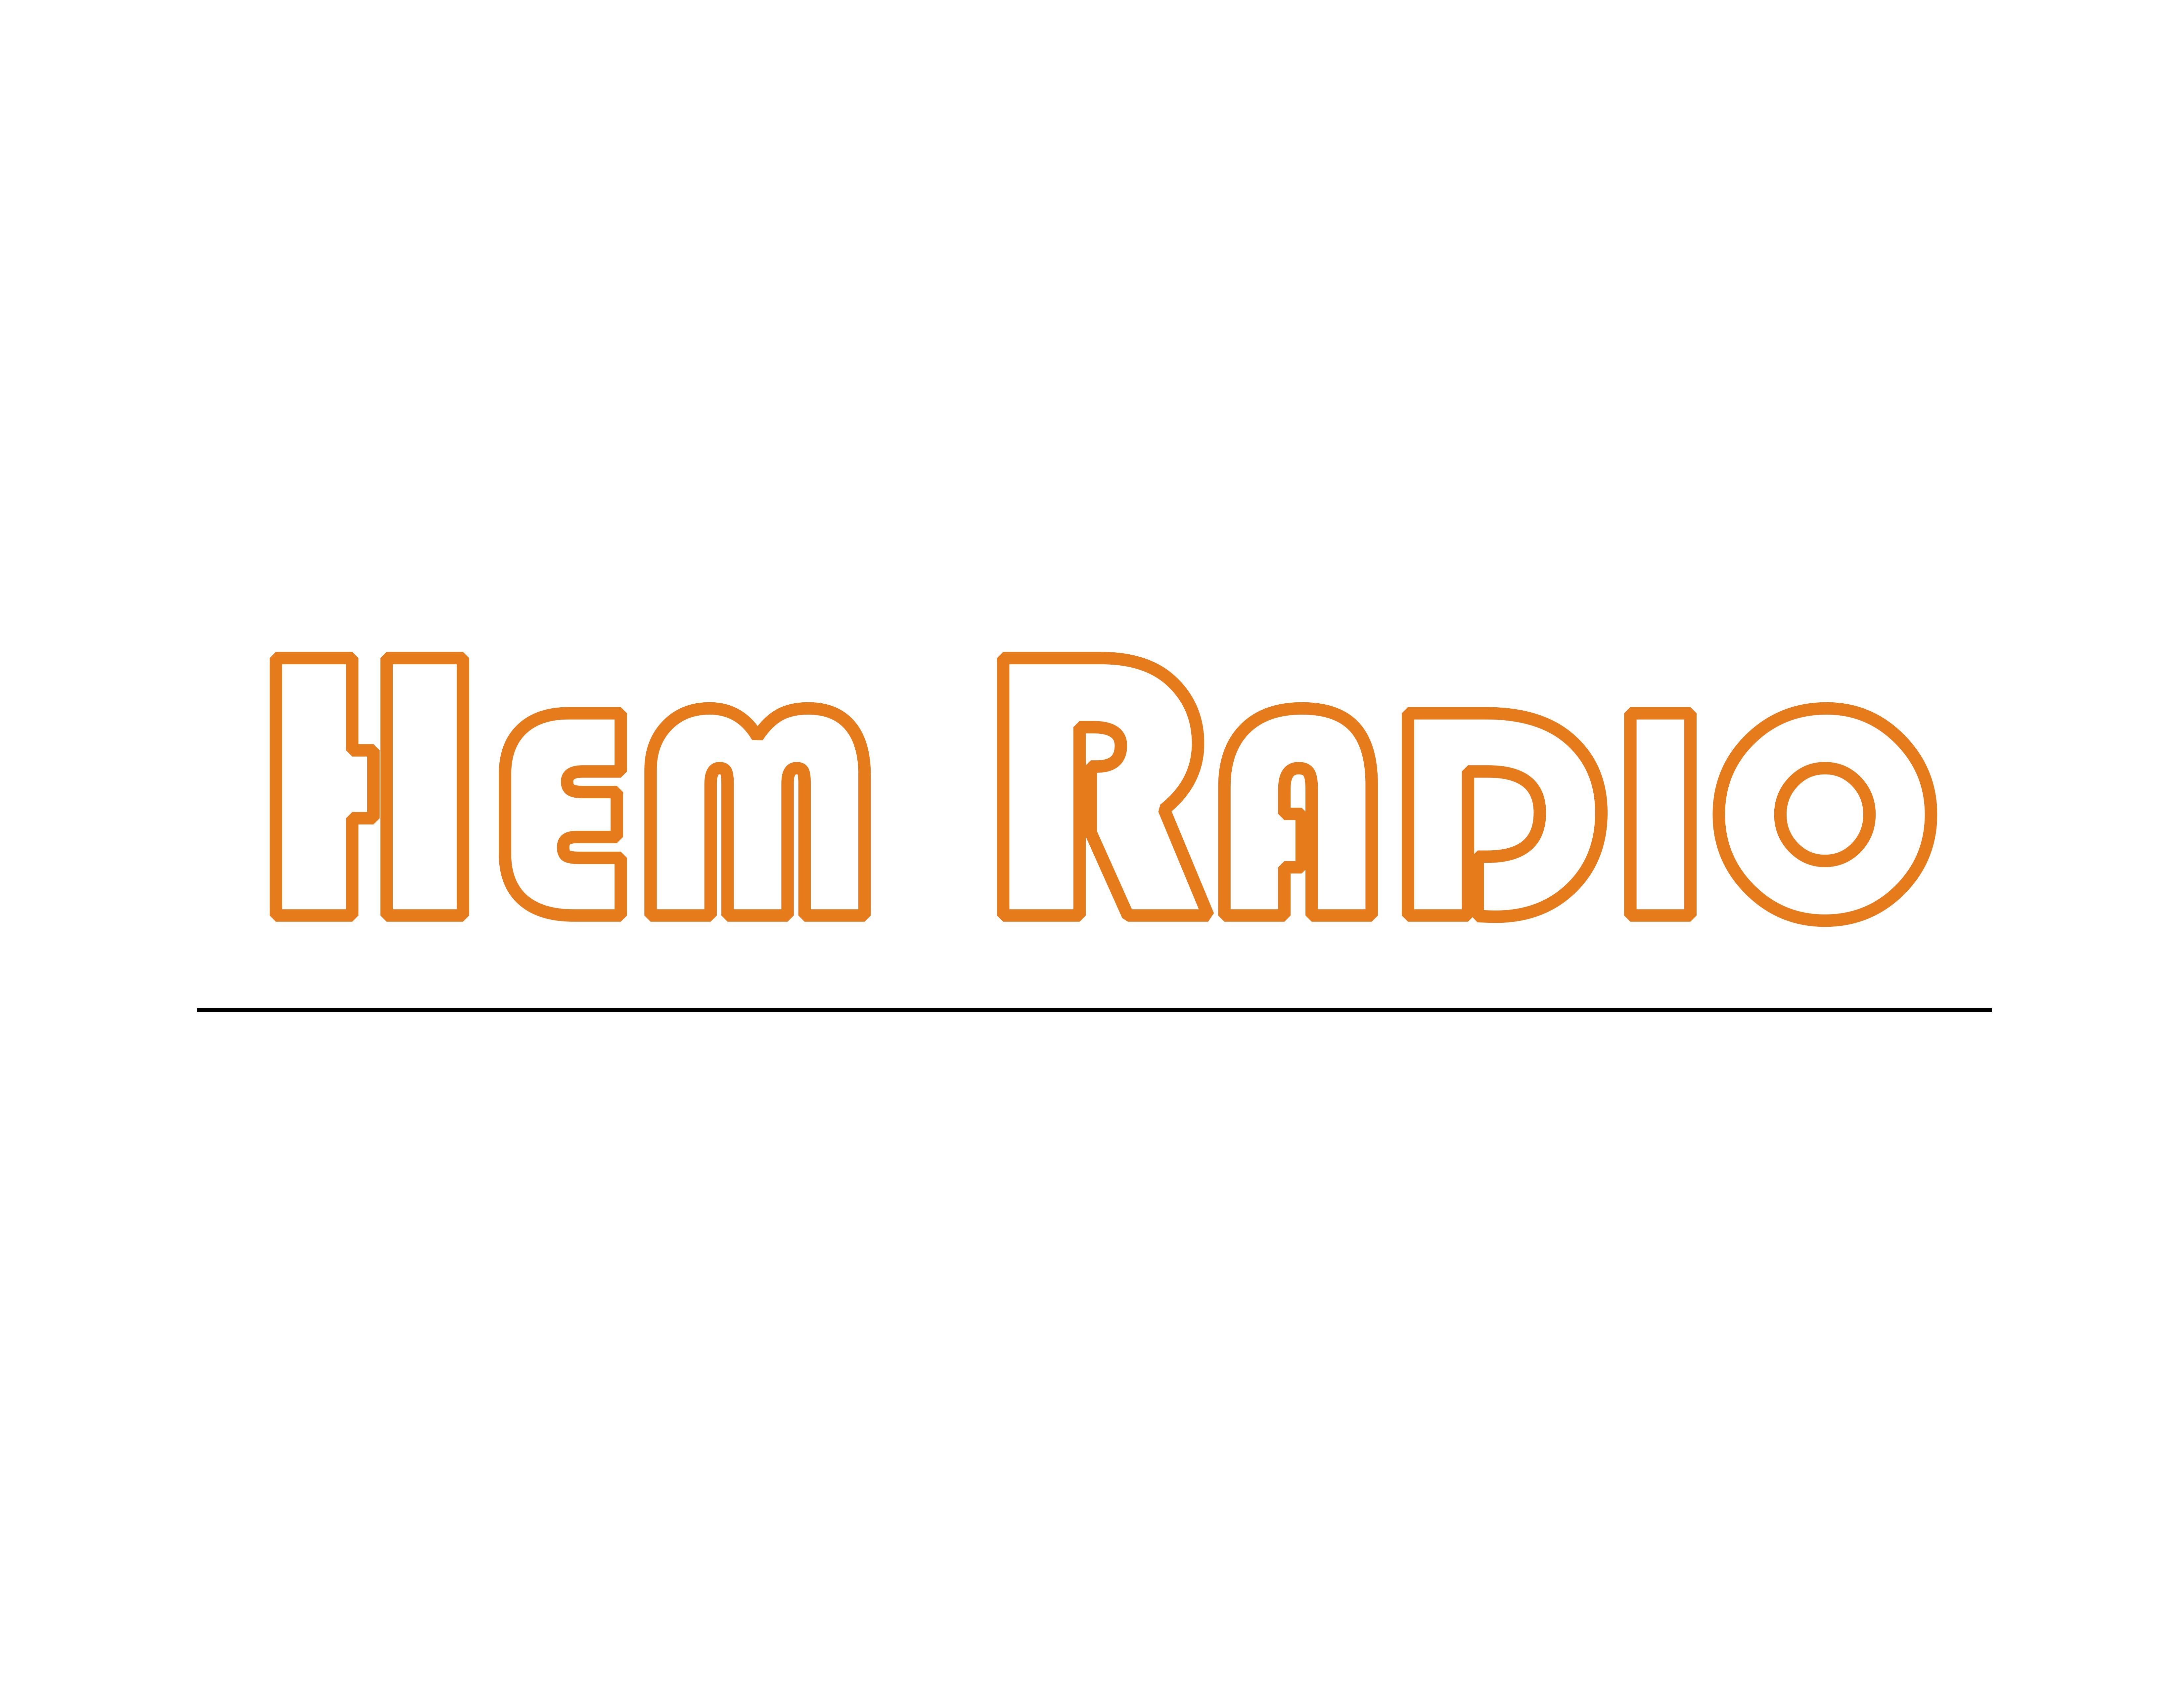 Hem Radio